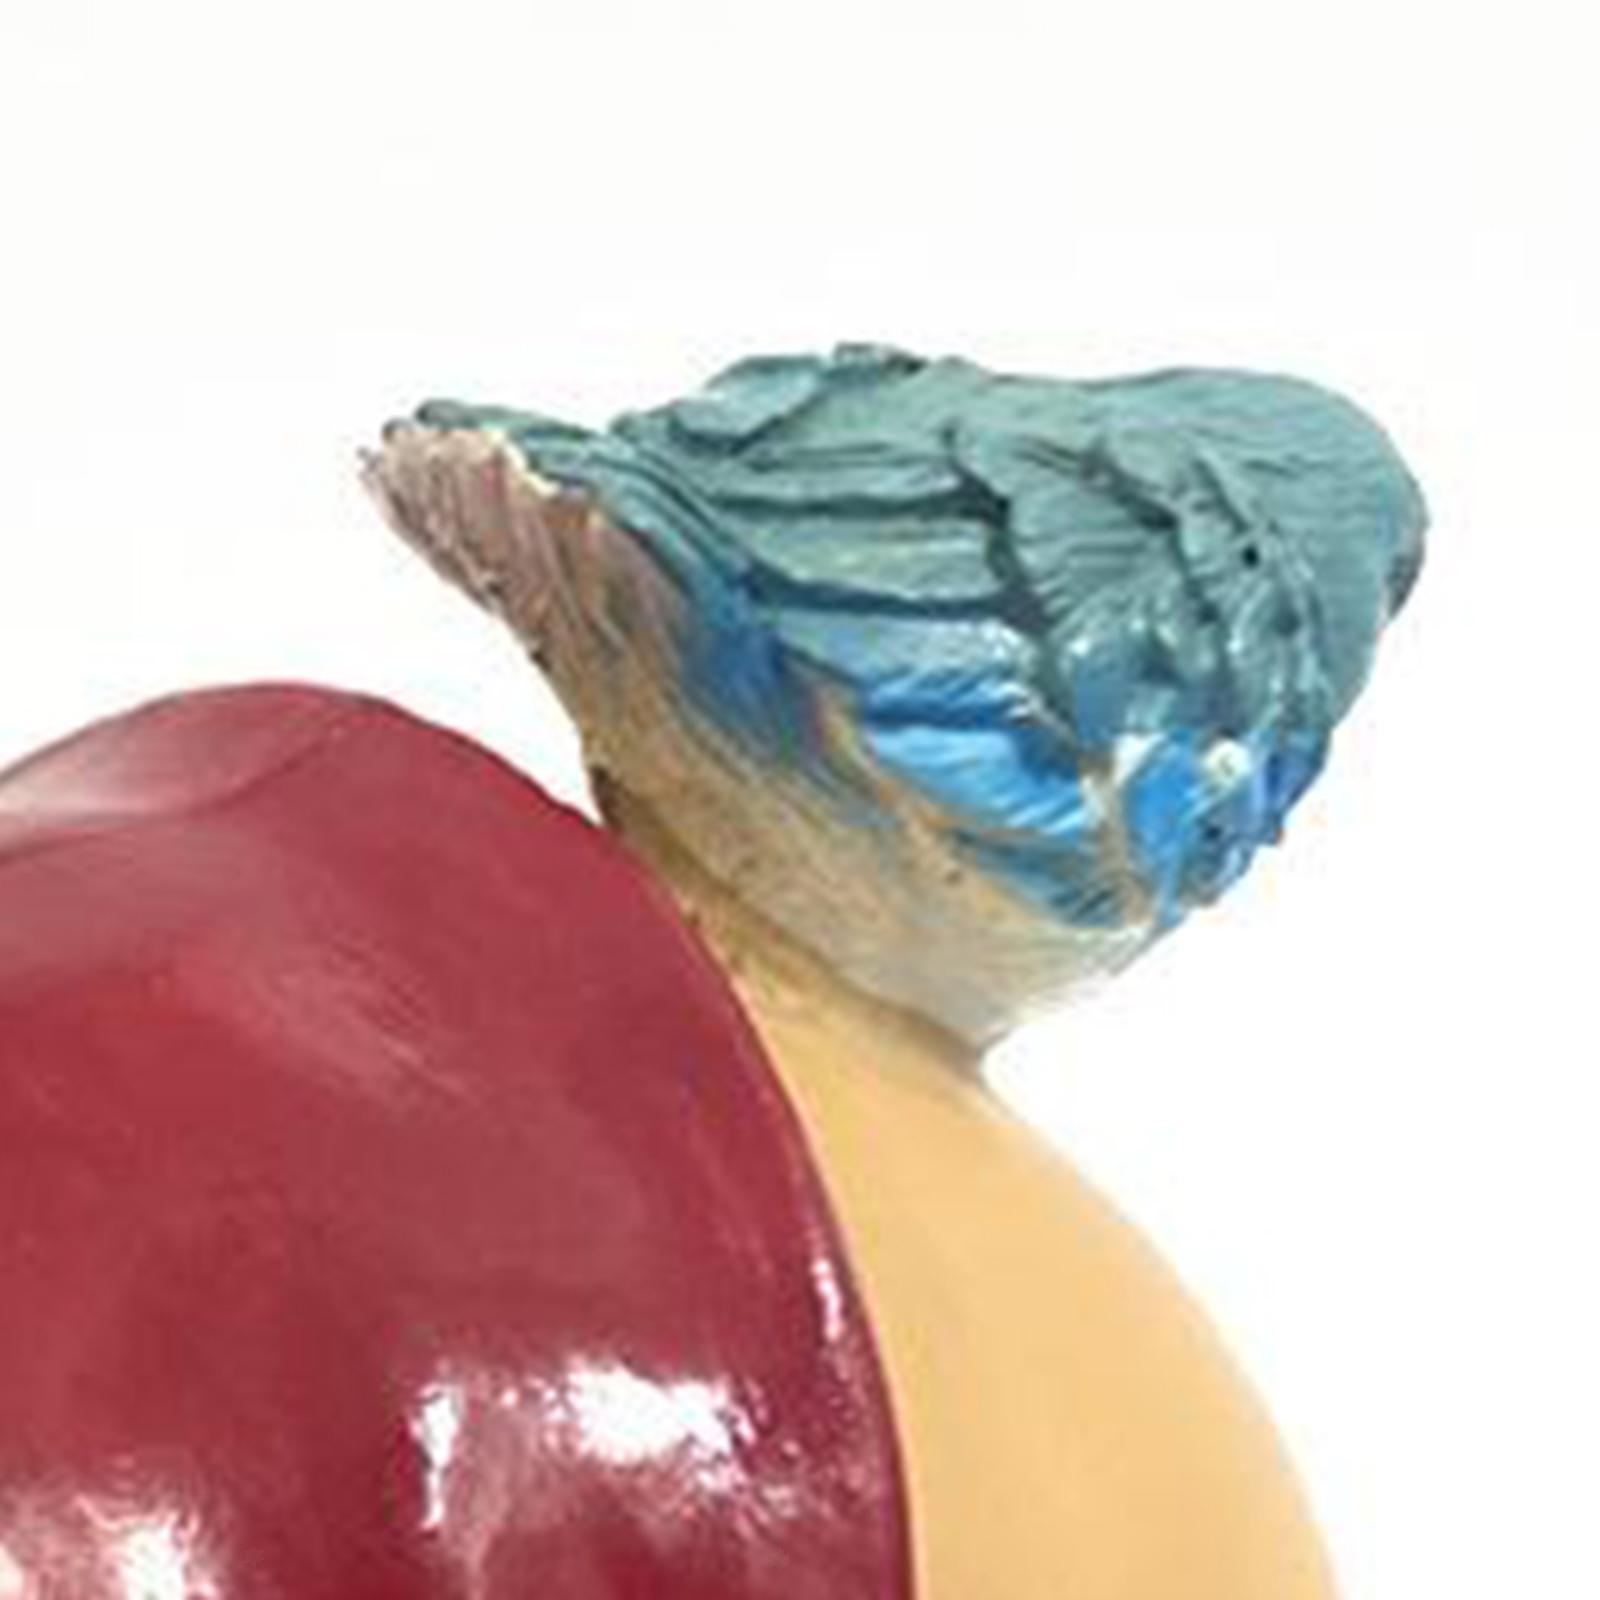 thumbnail 18 - Funny Resin Naughty Garden Gnome Statue Ornaments Villa Home Figurines Decor AU